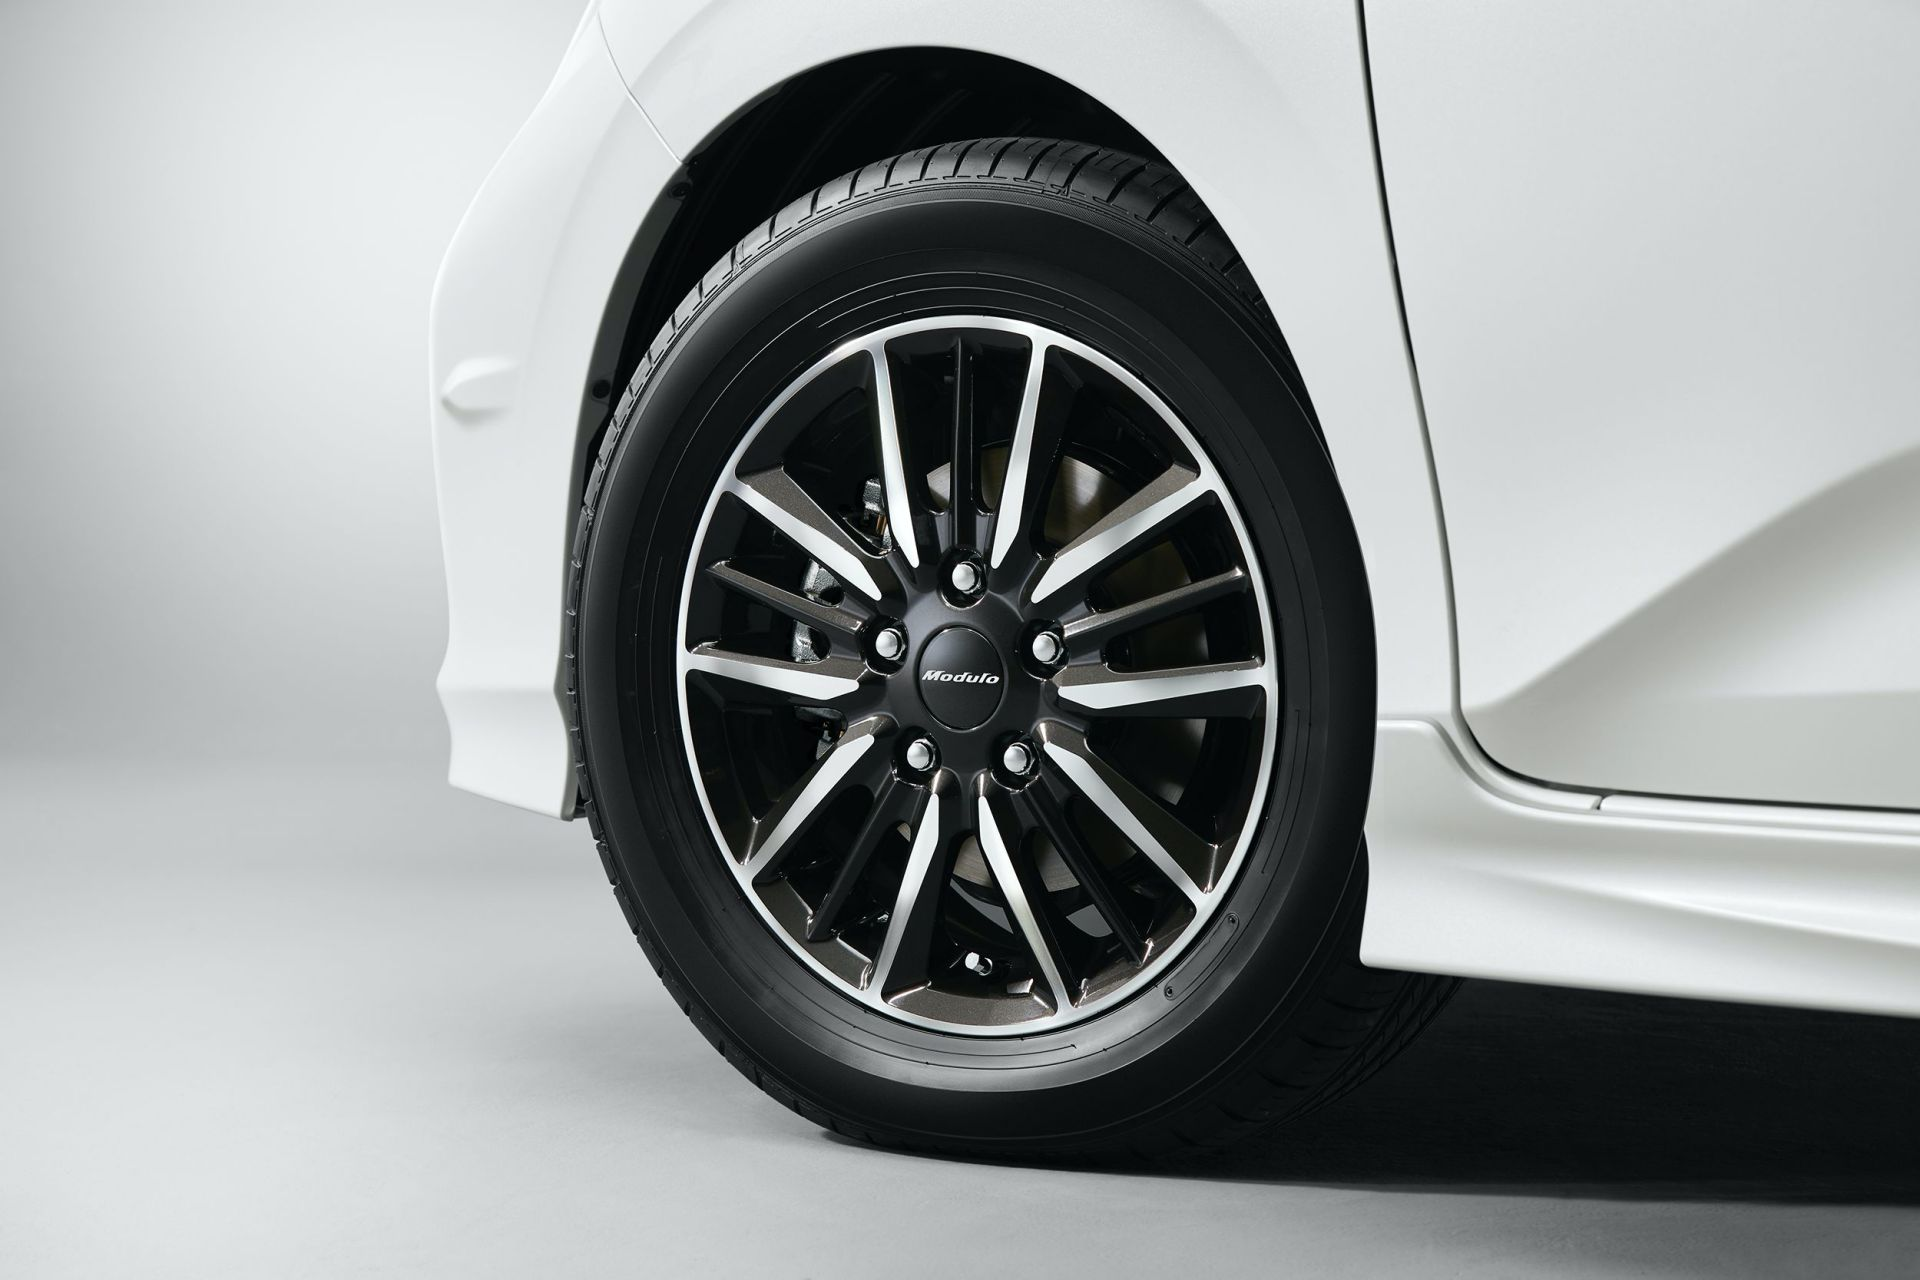 Honda-Freed-Modulo-X-Facelift-2020-40